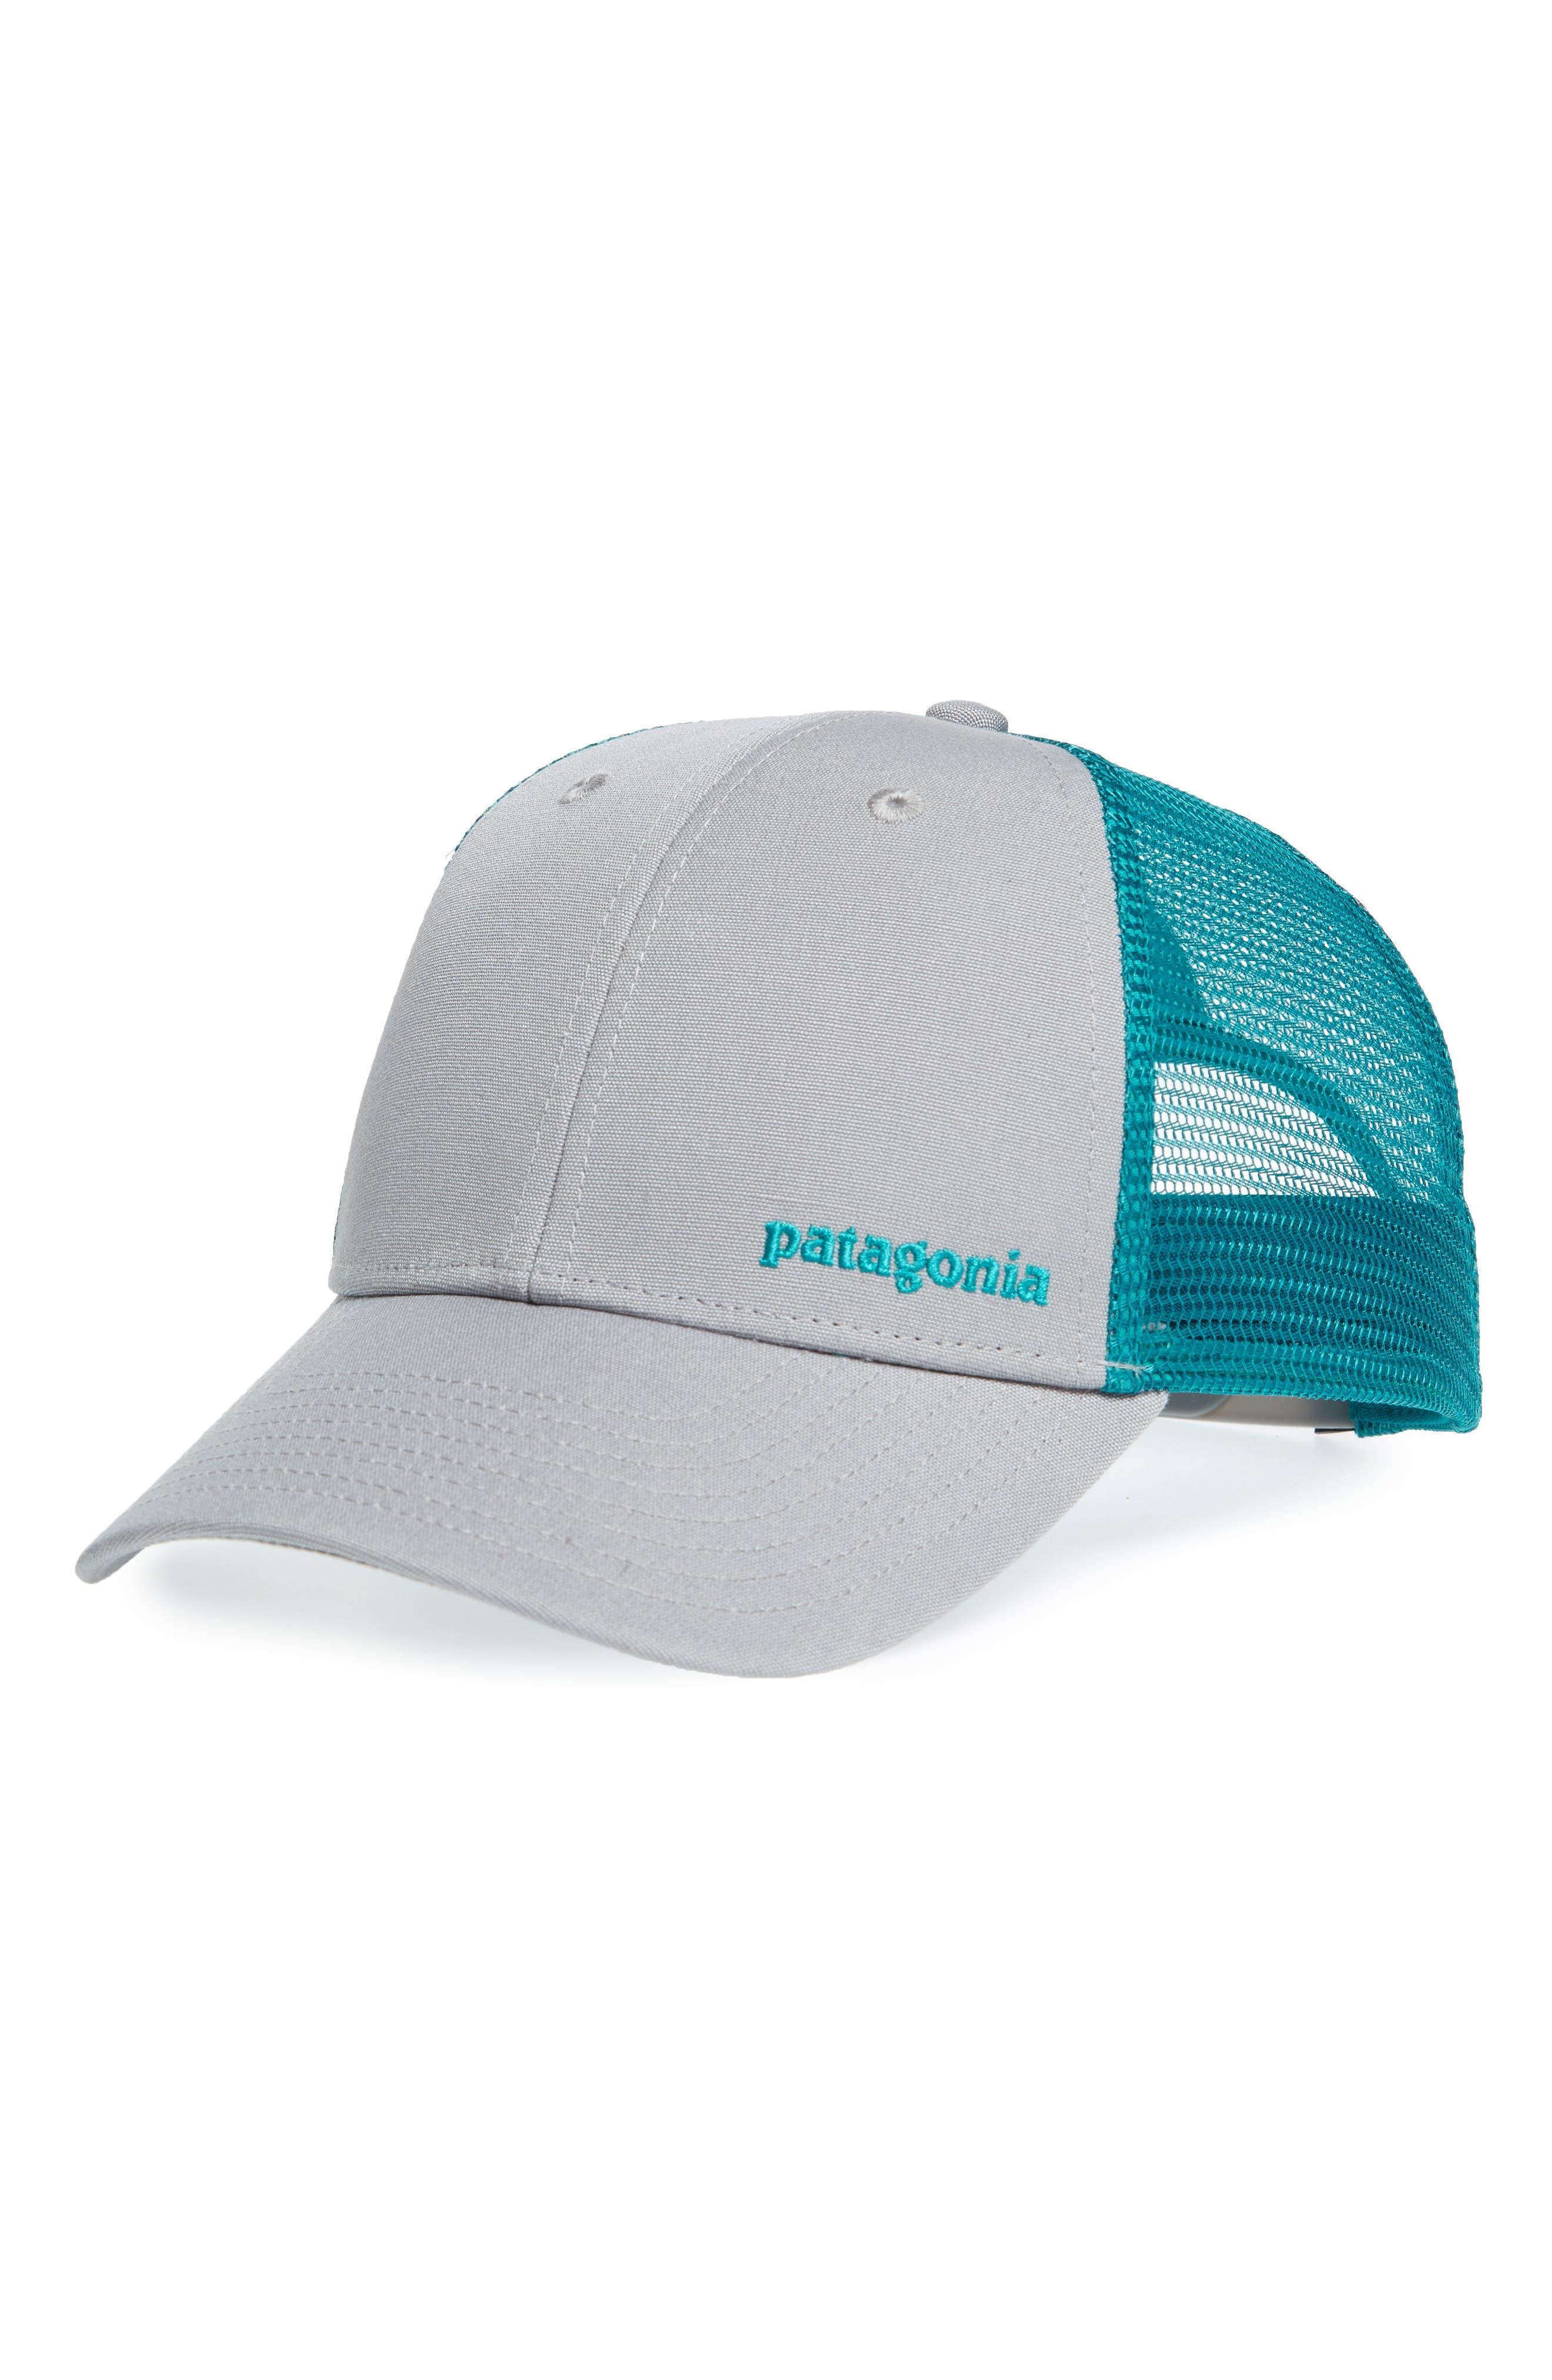 Text Logo Trucker Hat,                             Main thumbnail 1, color,                             020